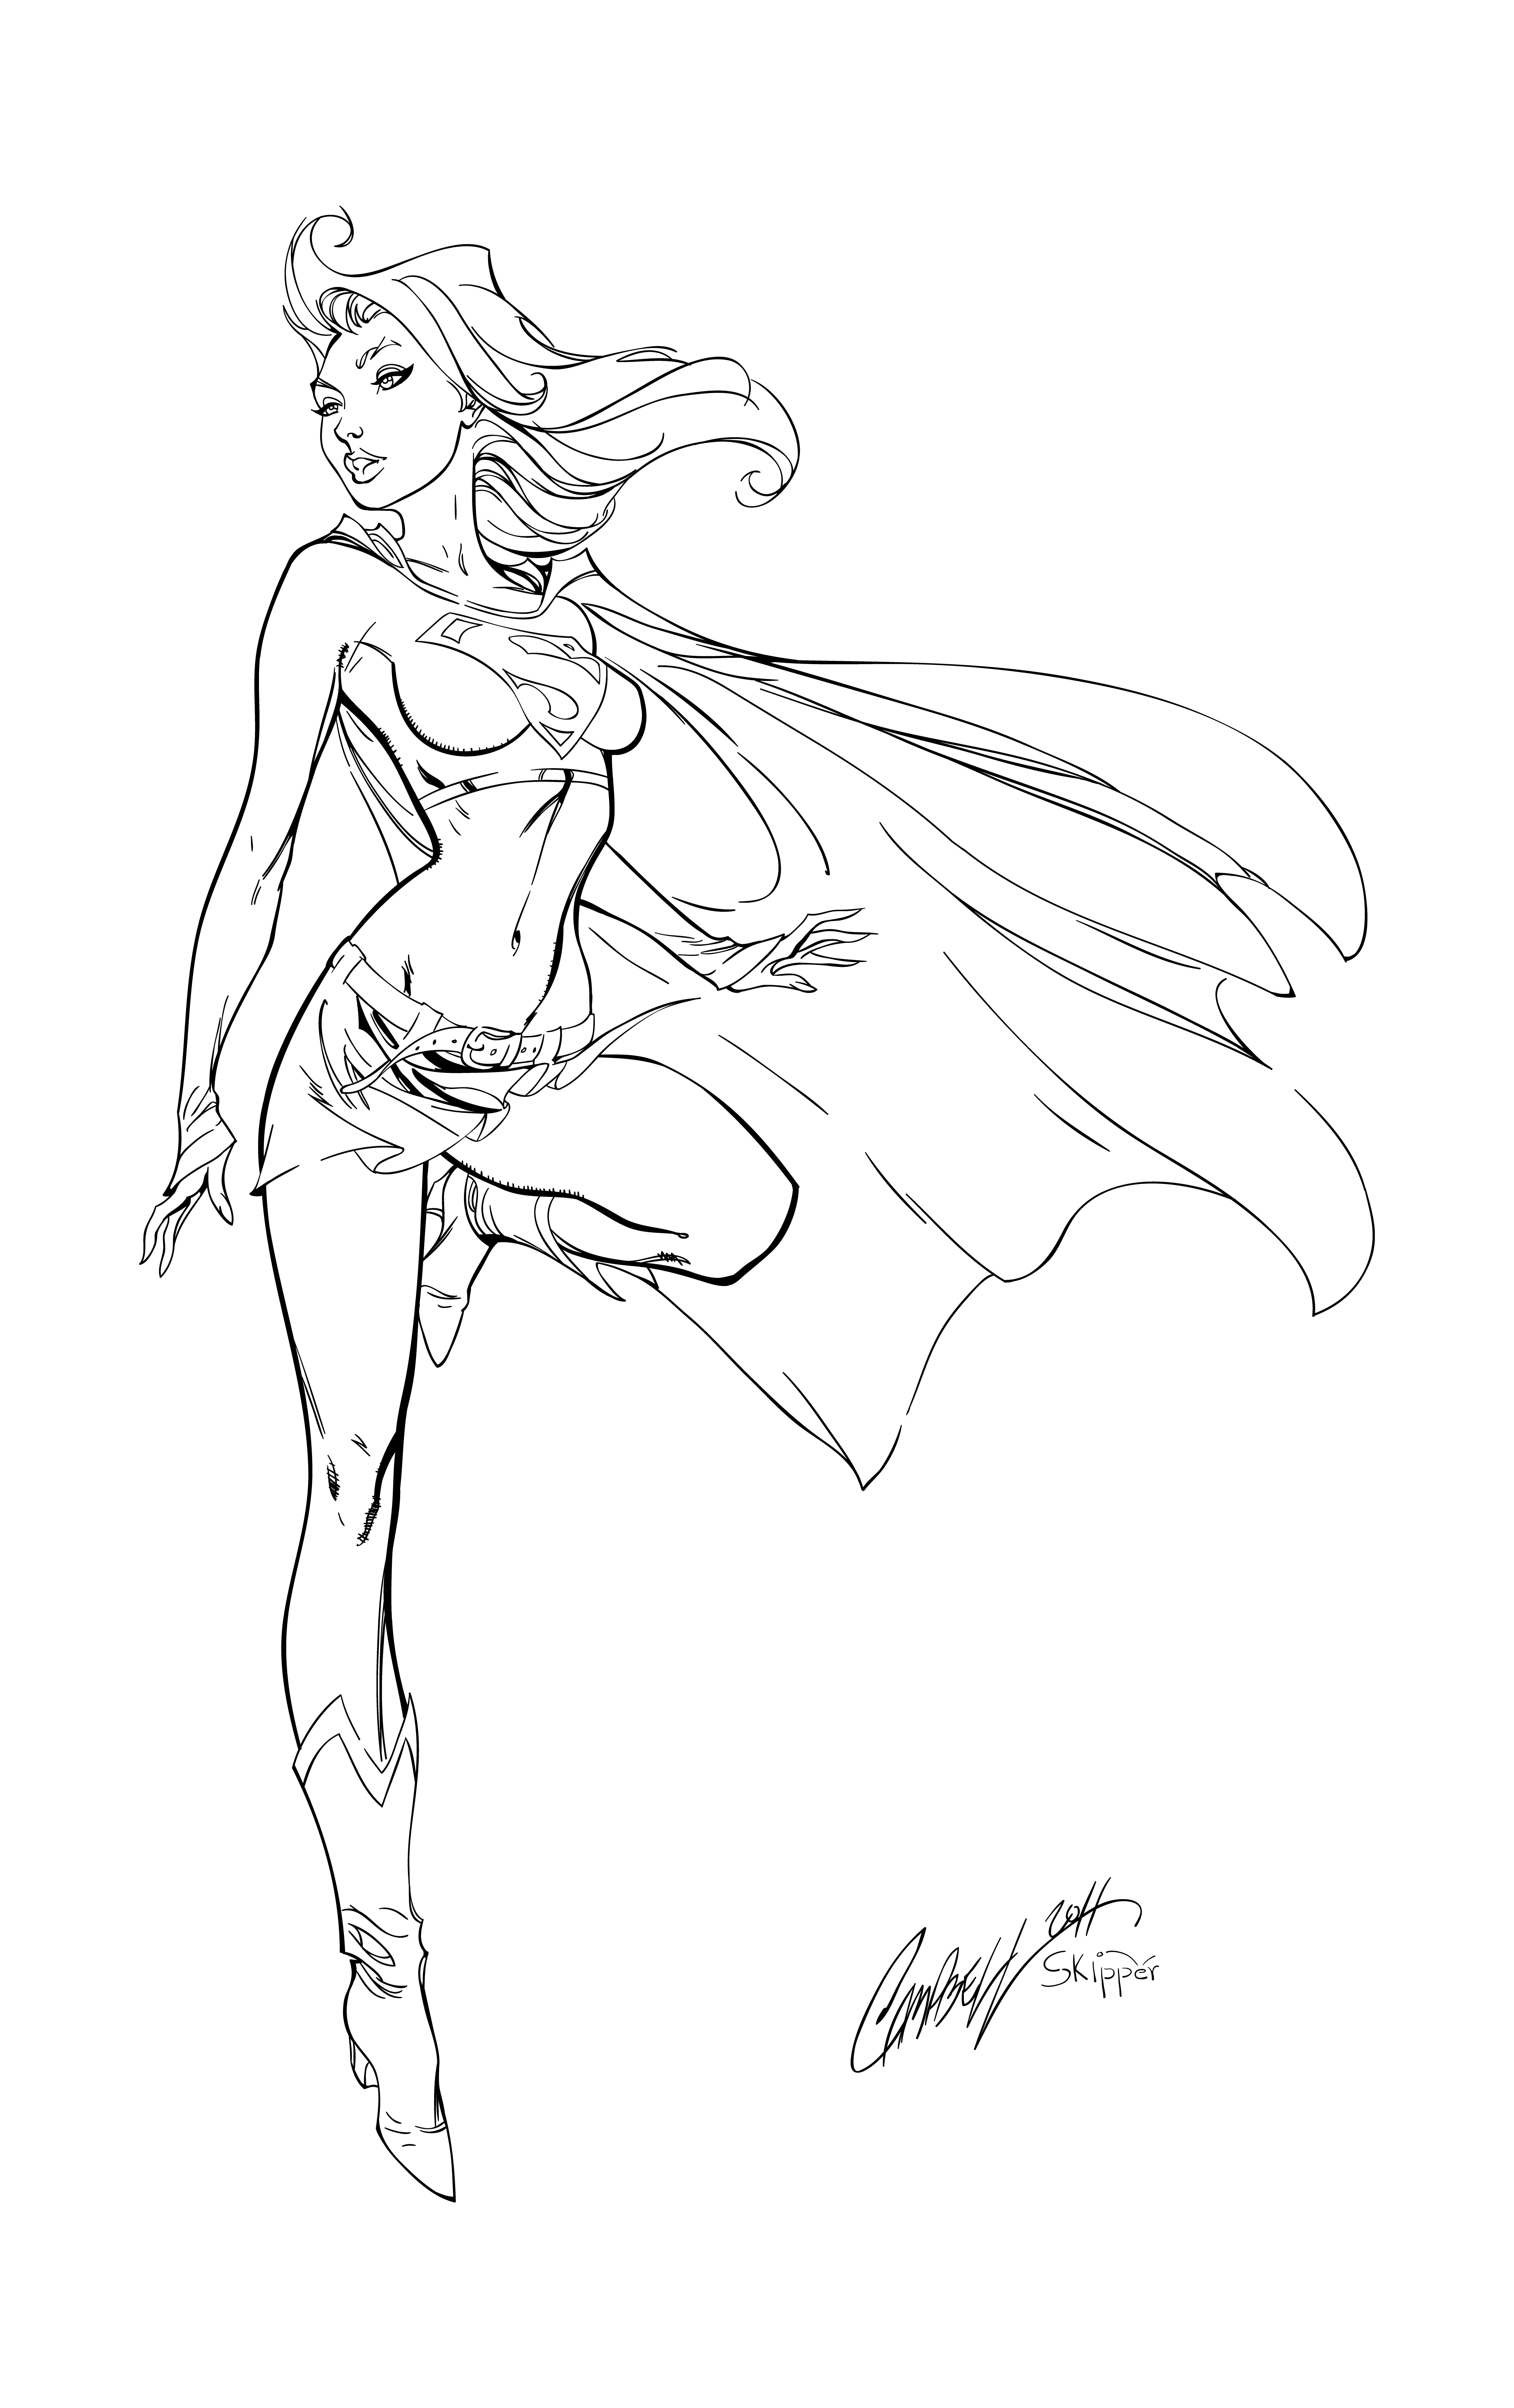 supergirl lineart 2013 by dstpierre on deviantart